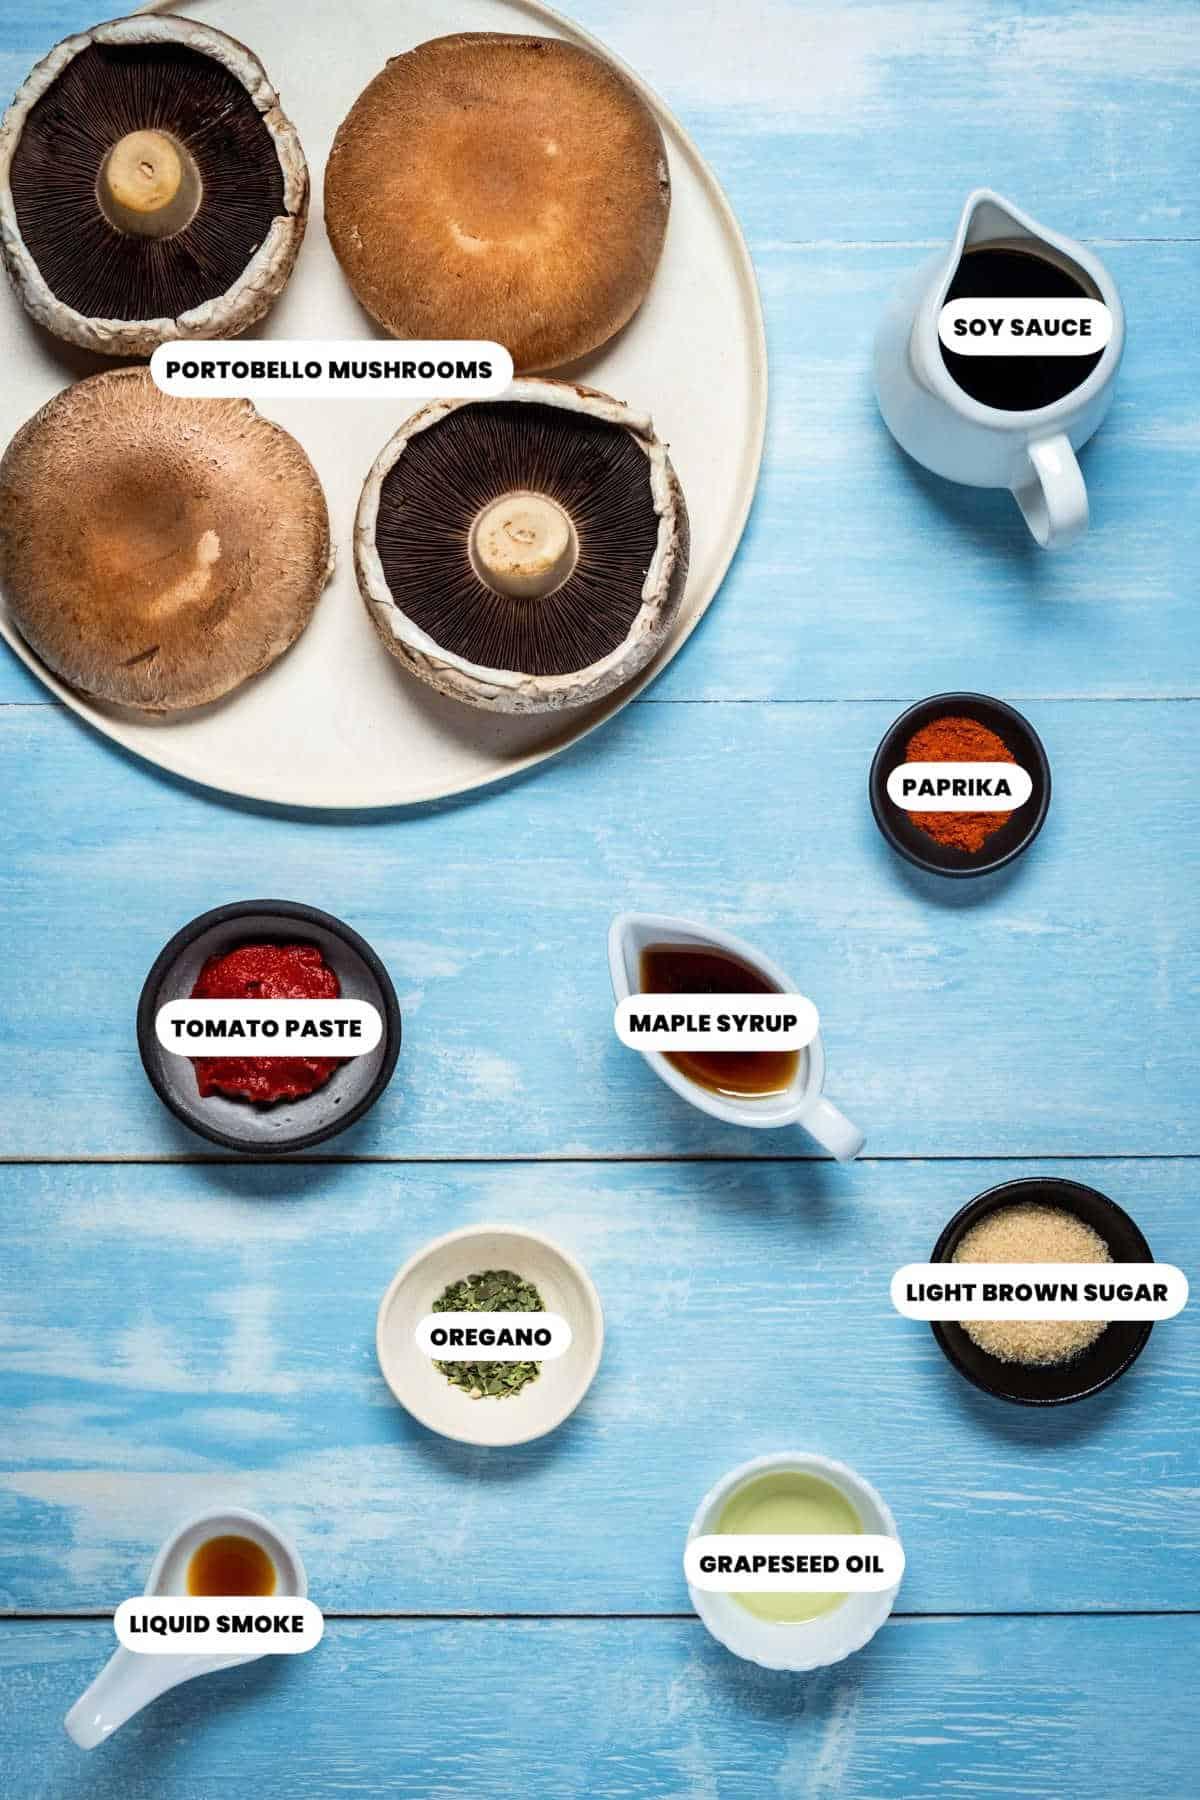 Photo of ingredients for the portobello mushrooms.